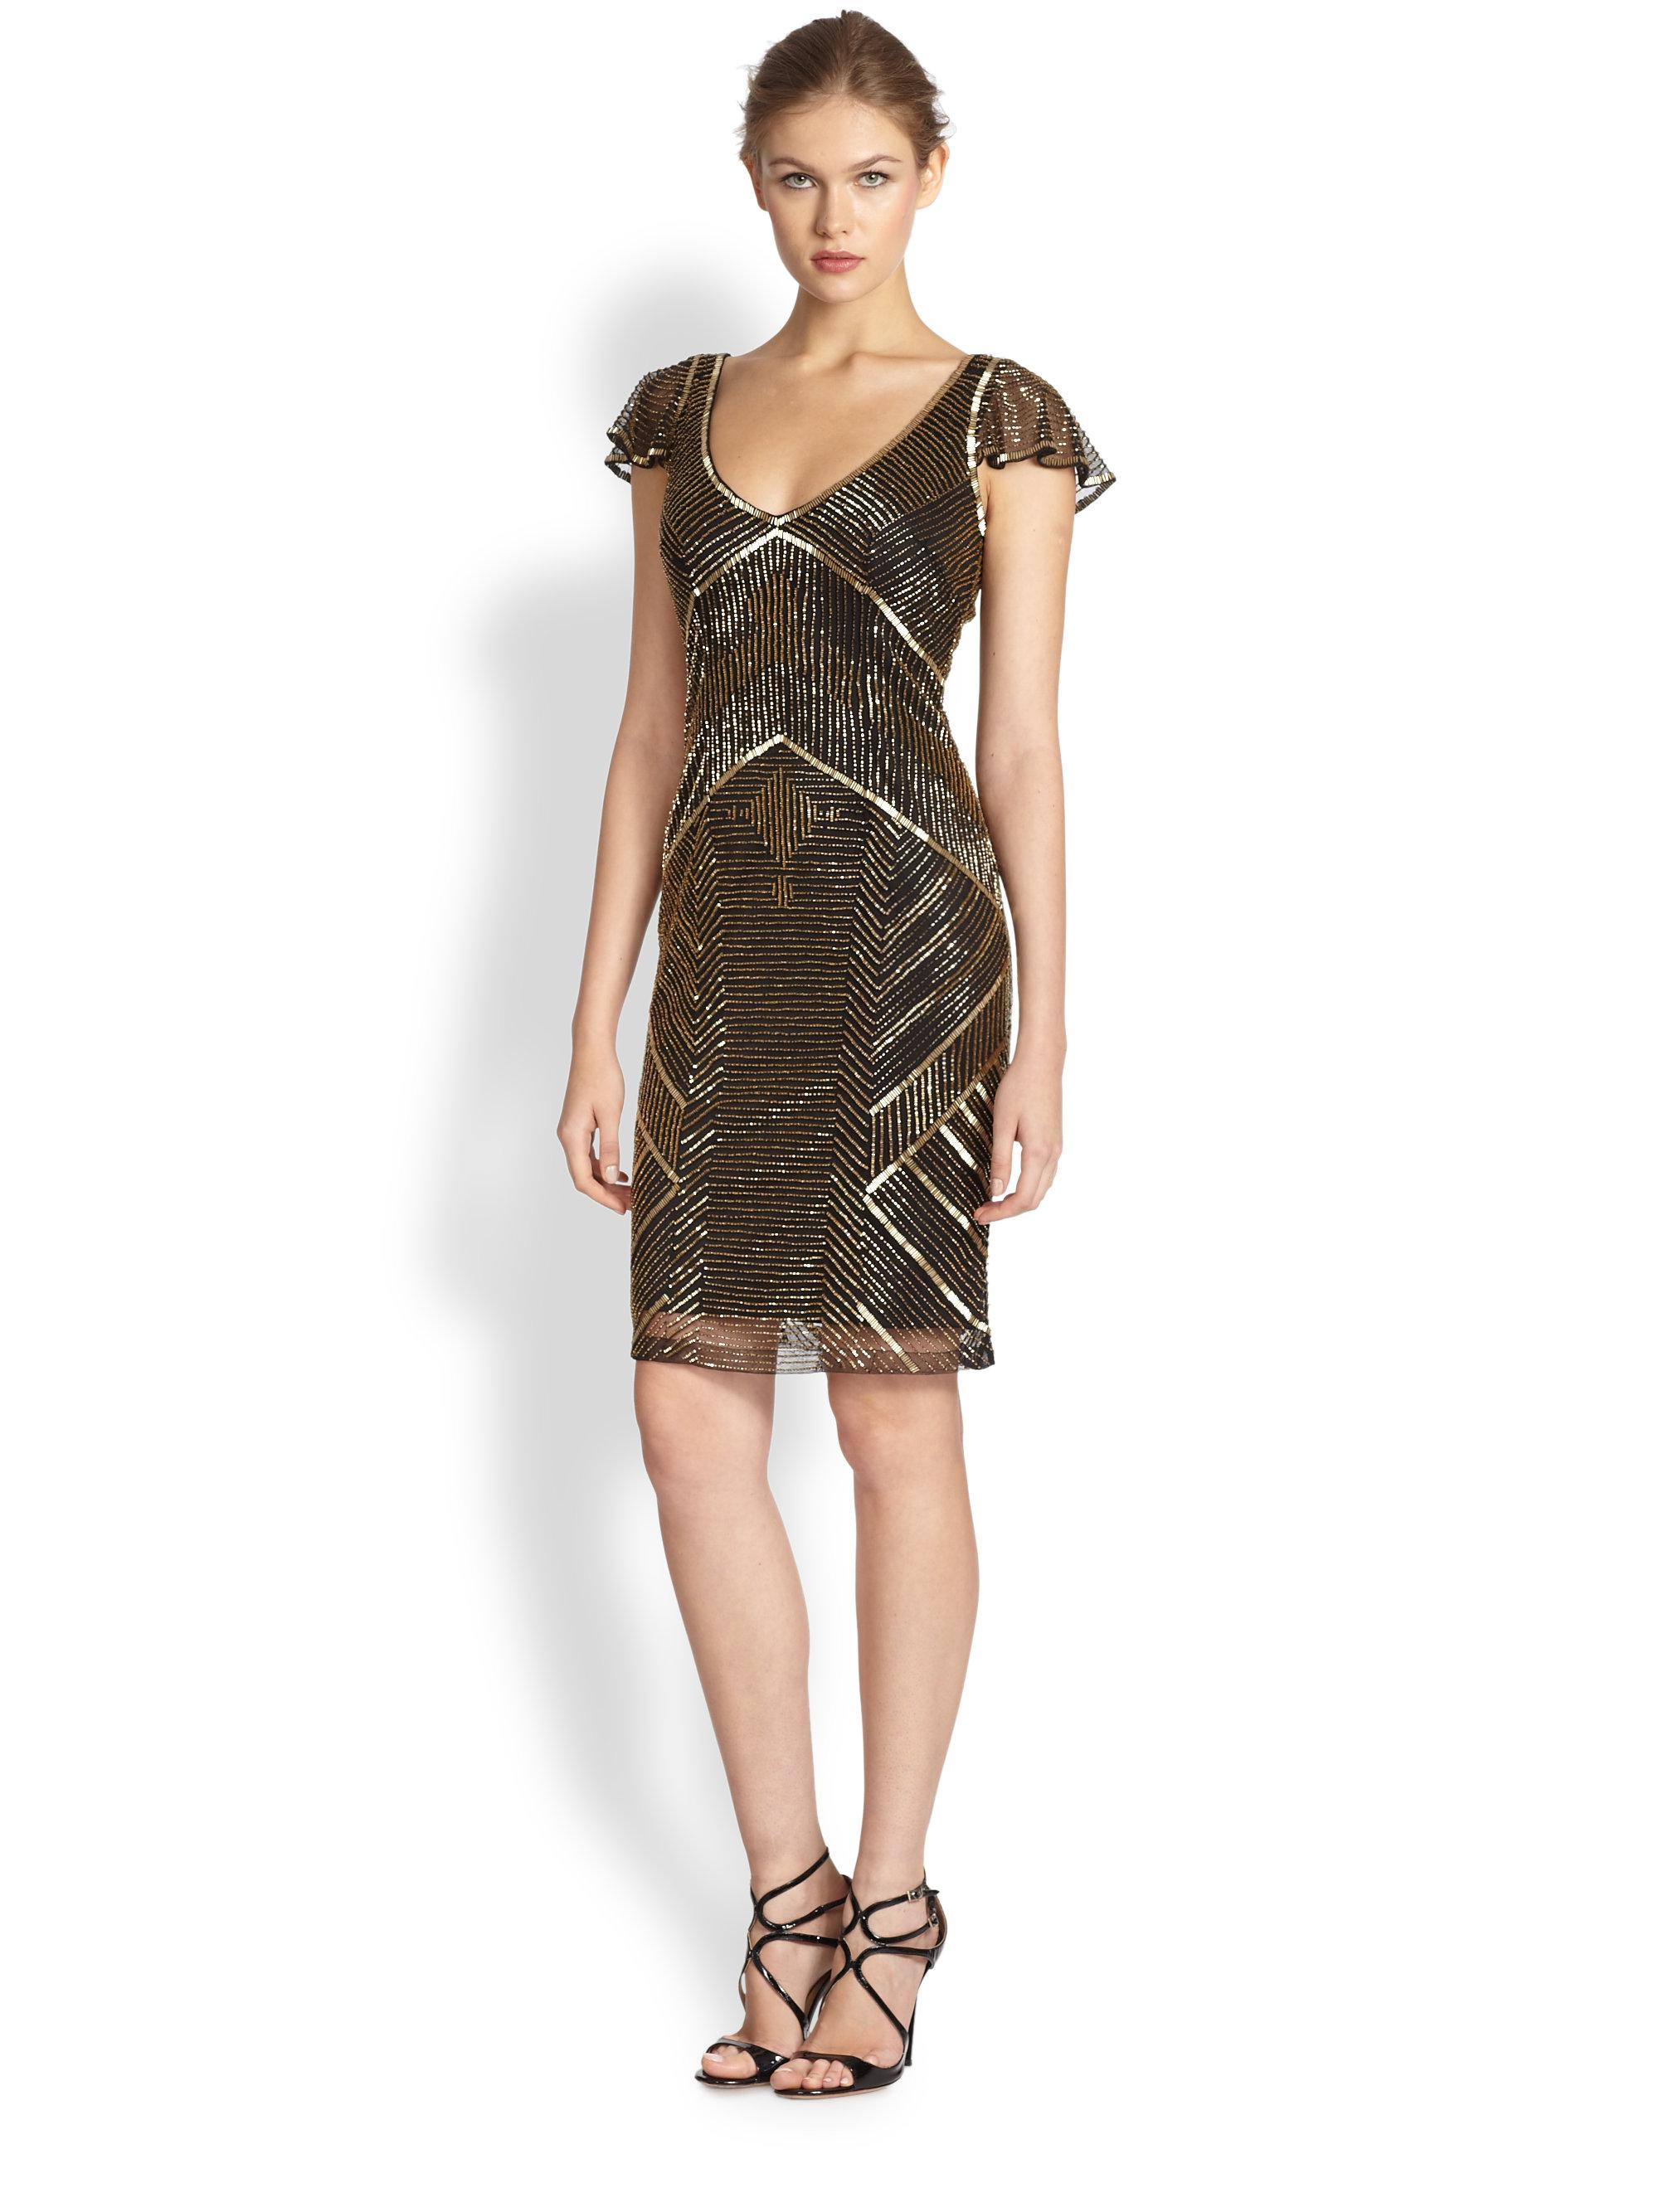 Metallic cocktail dress pictures